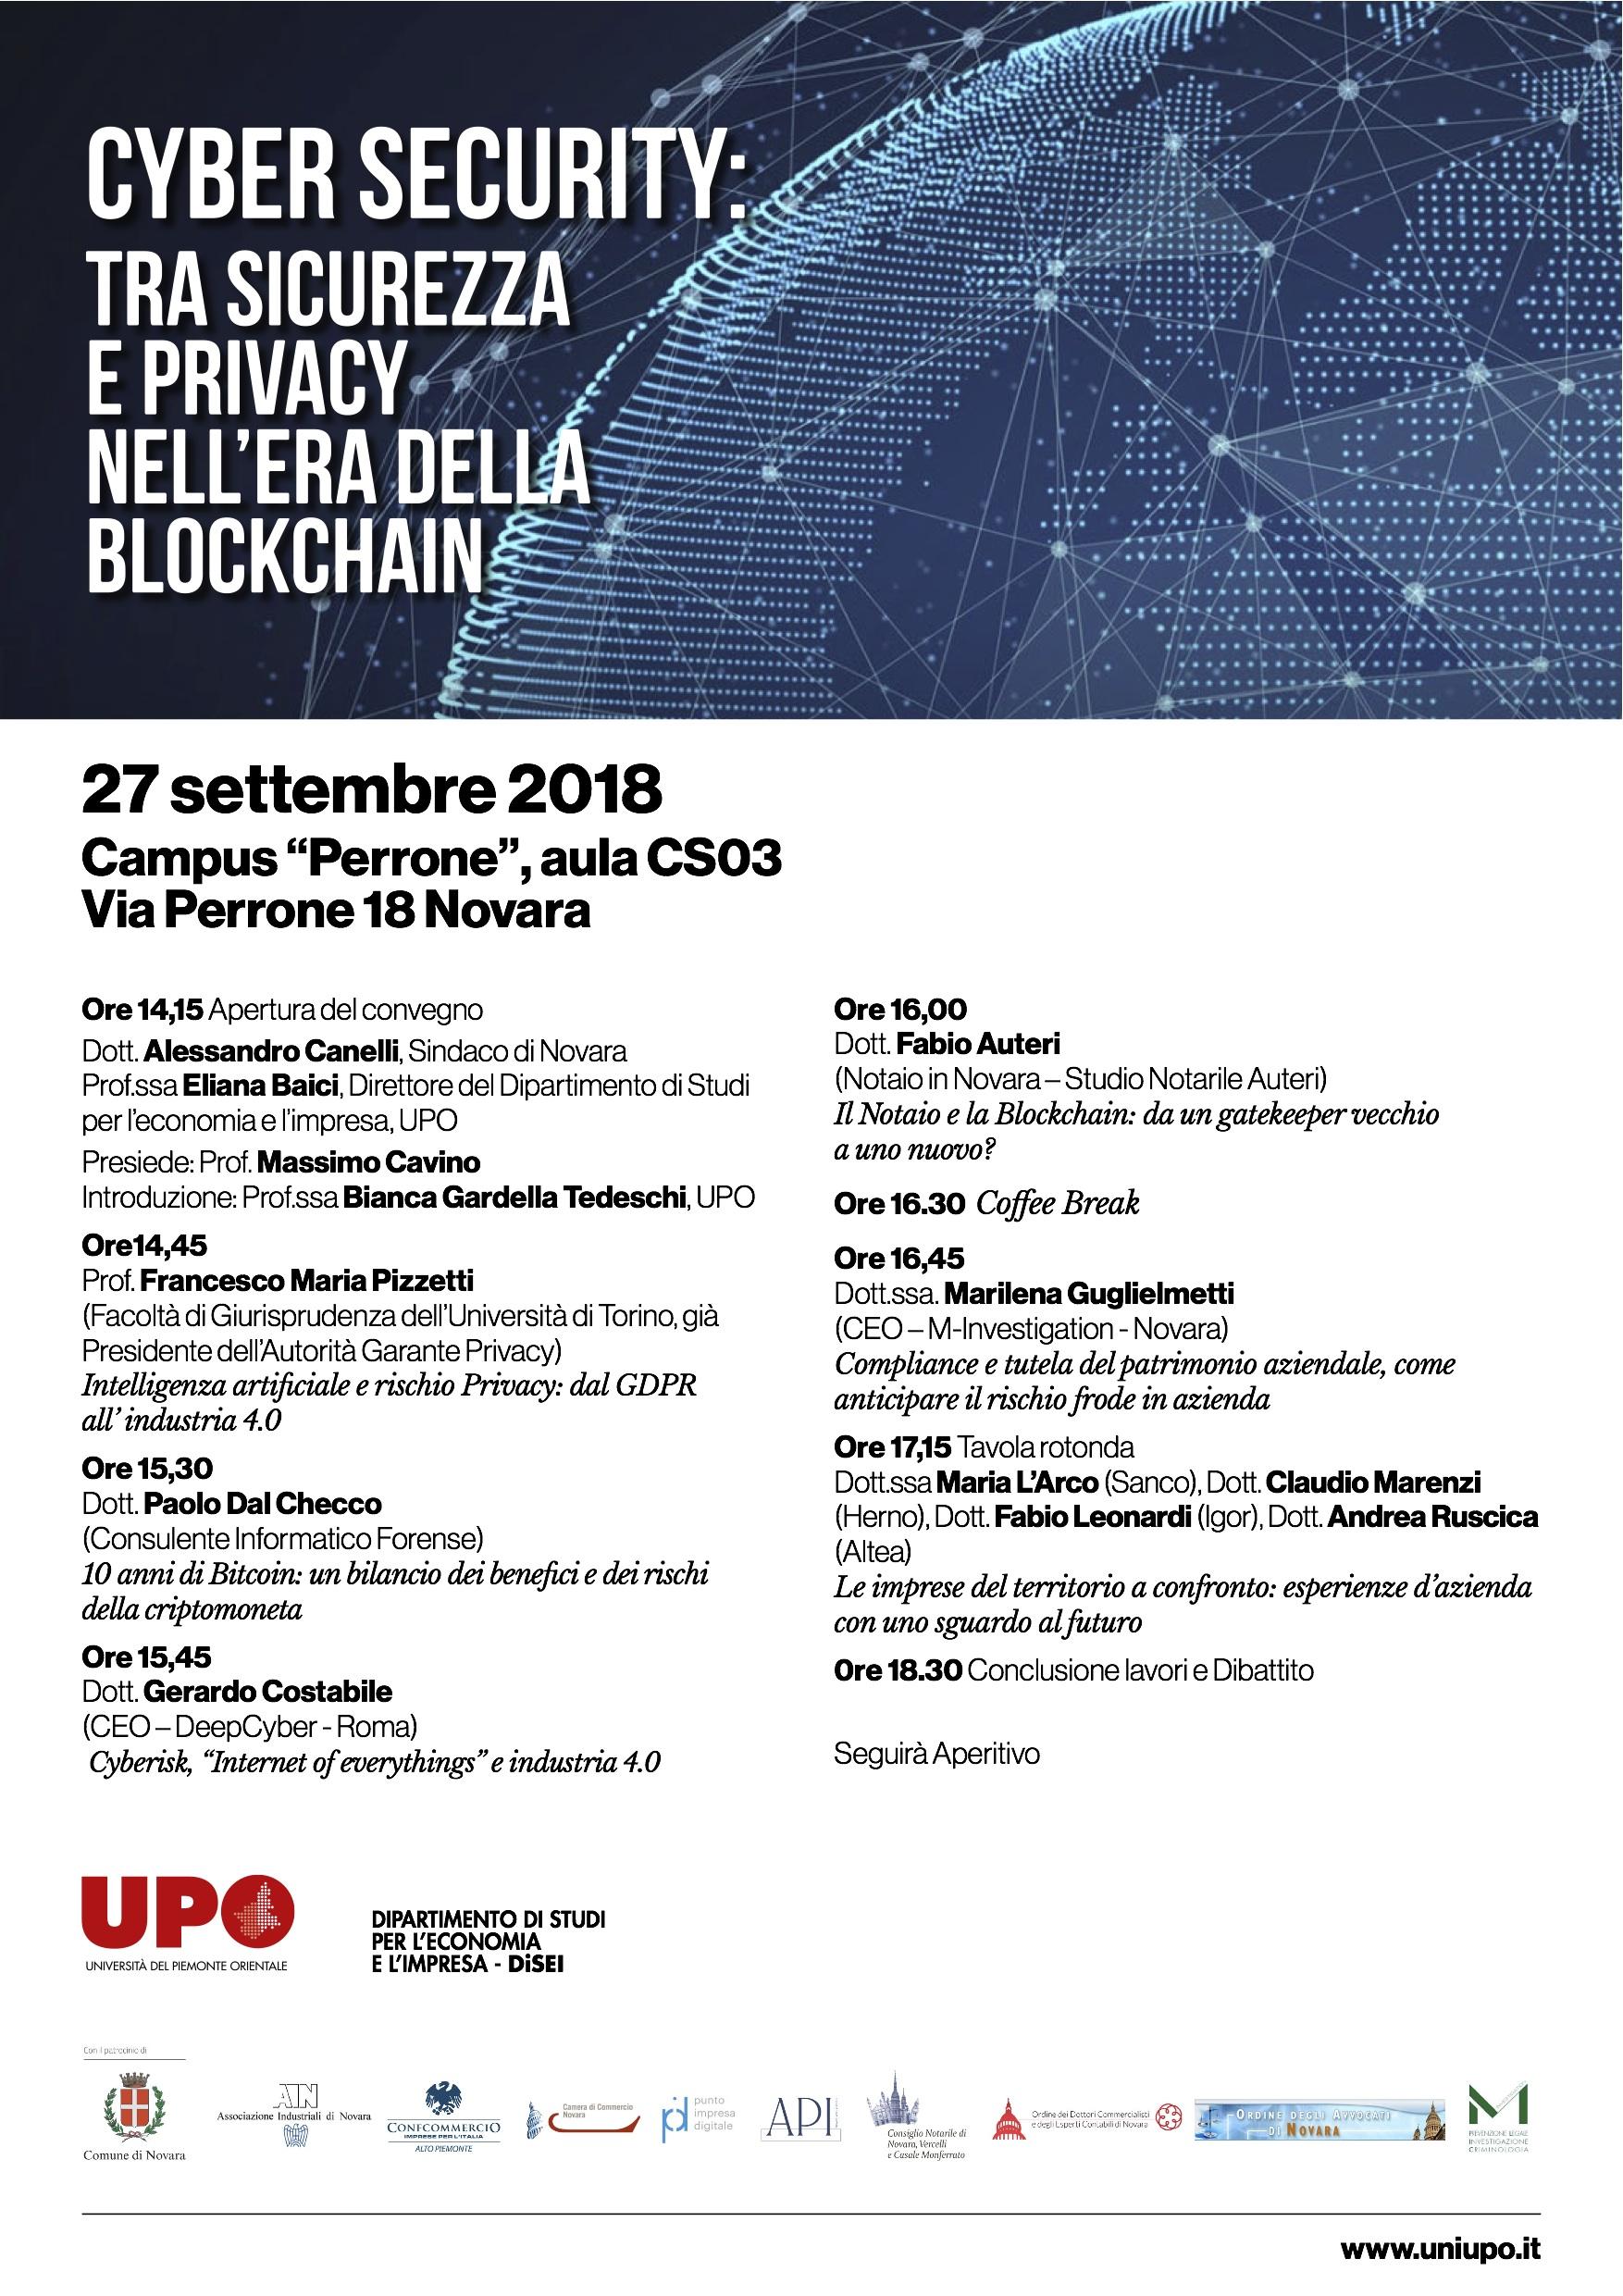 Upo Blockchain.jpg